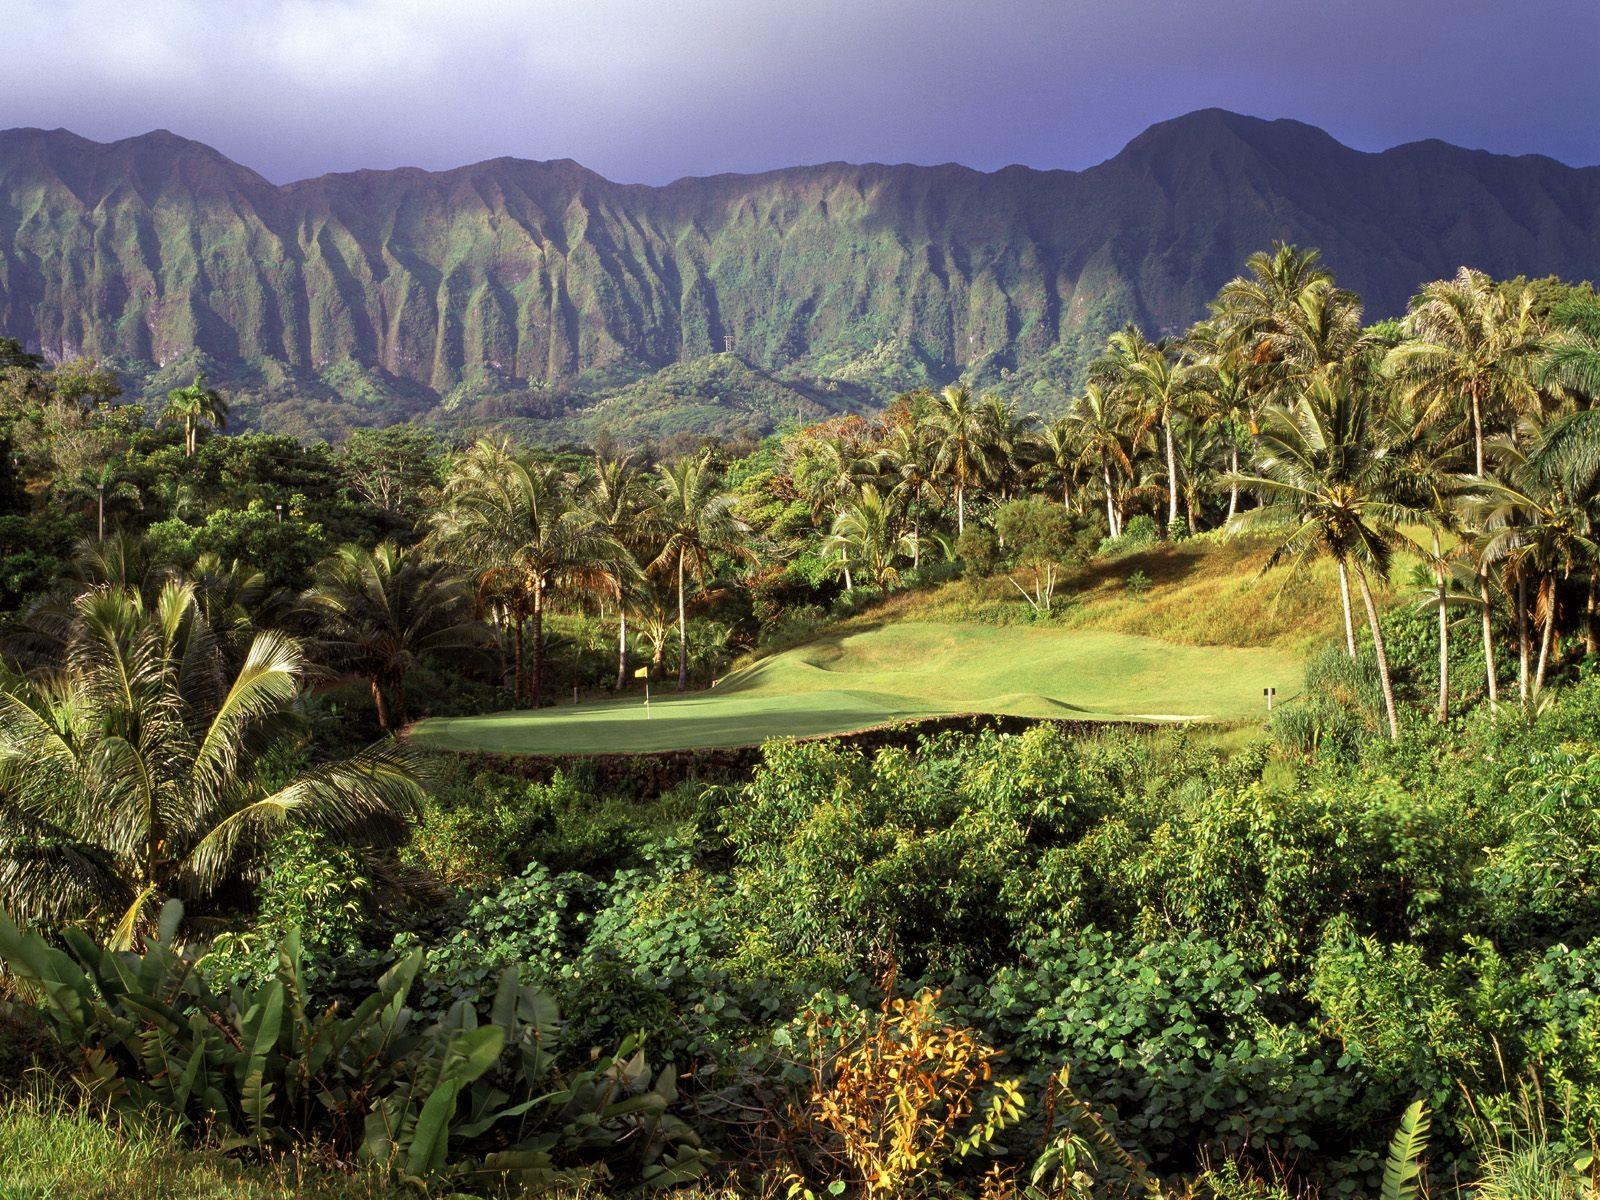 http://3.bp.blogspot.com/-LKK-5lqcE2o/TfrgRJ6uvXI/AAAAAAAAFGk/jn8E0TiEPG8/s1600/3rd-hole-luana-hills-oahu-hawaii.jpg